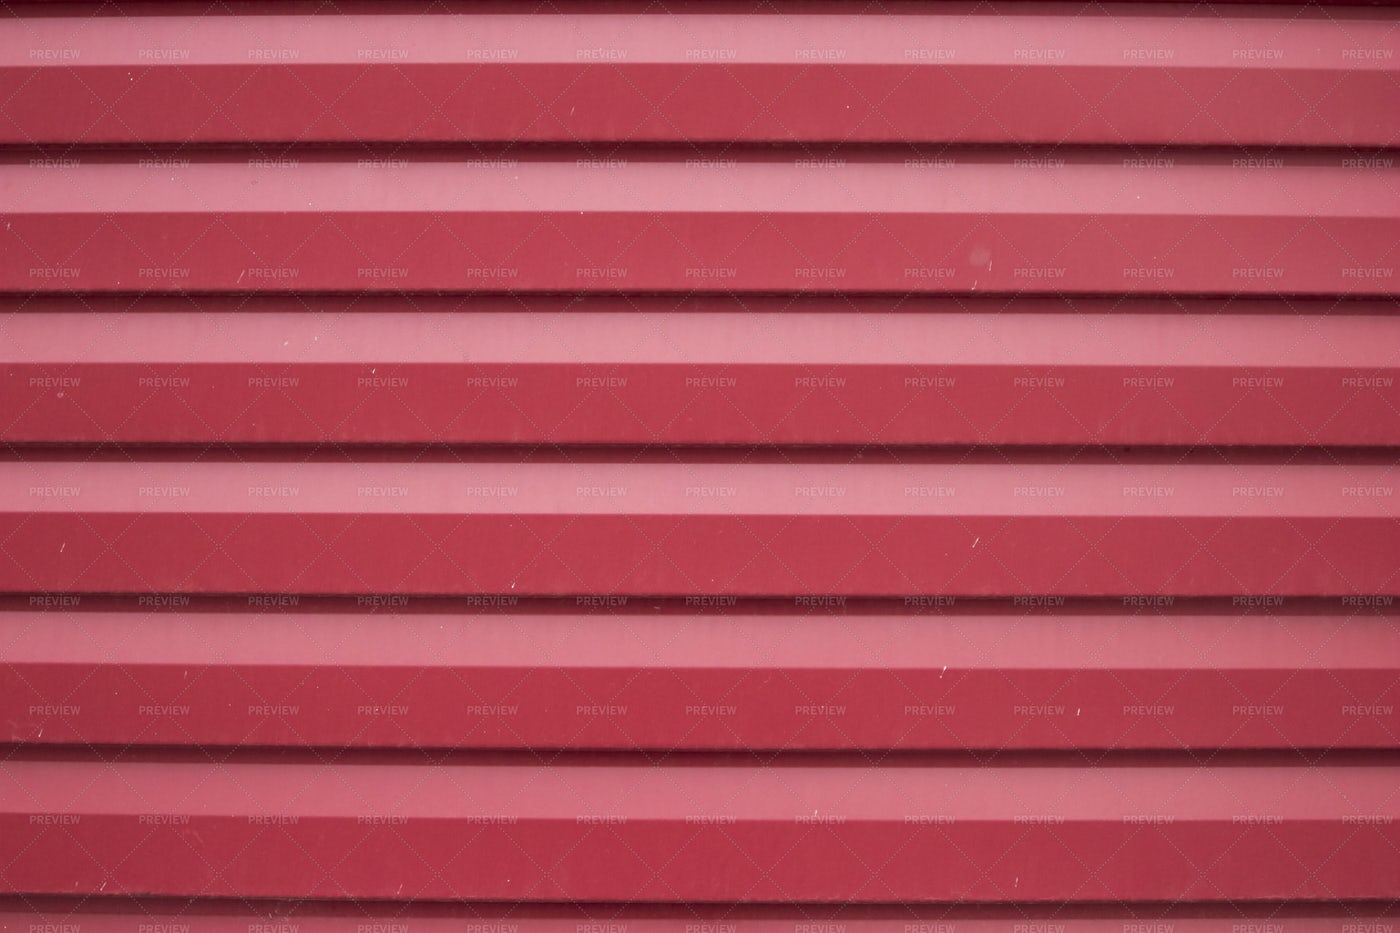 Red Metal Wall: Stock Photos